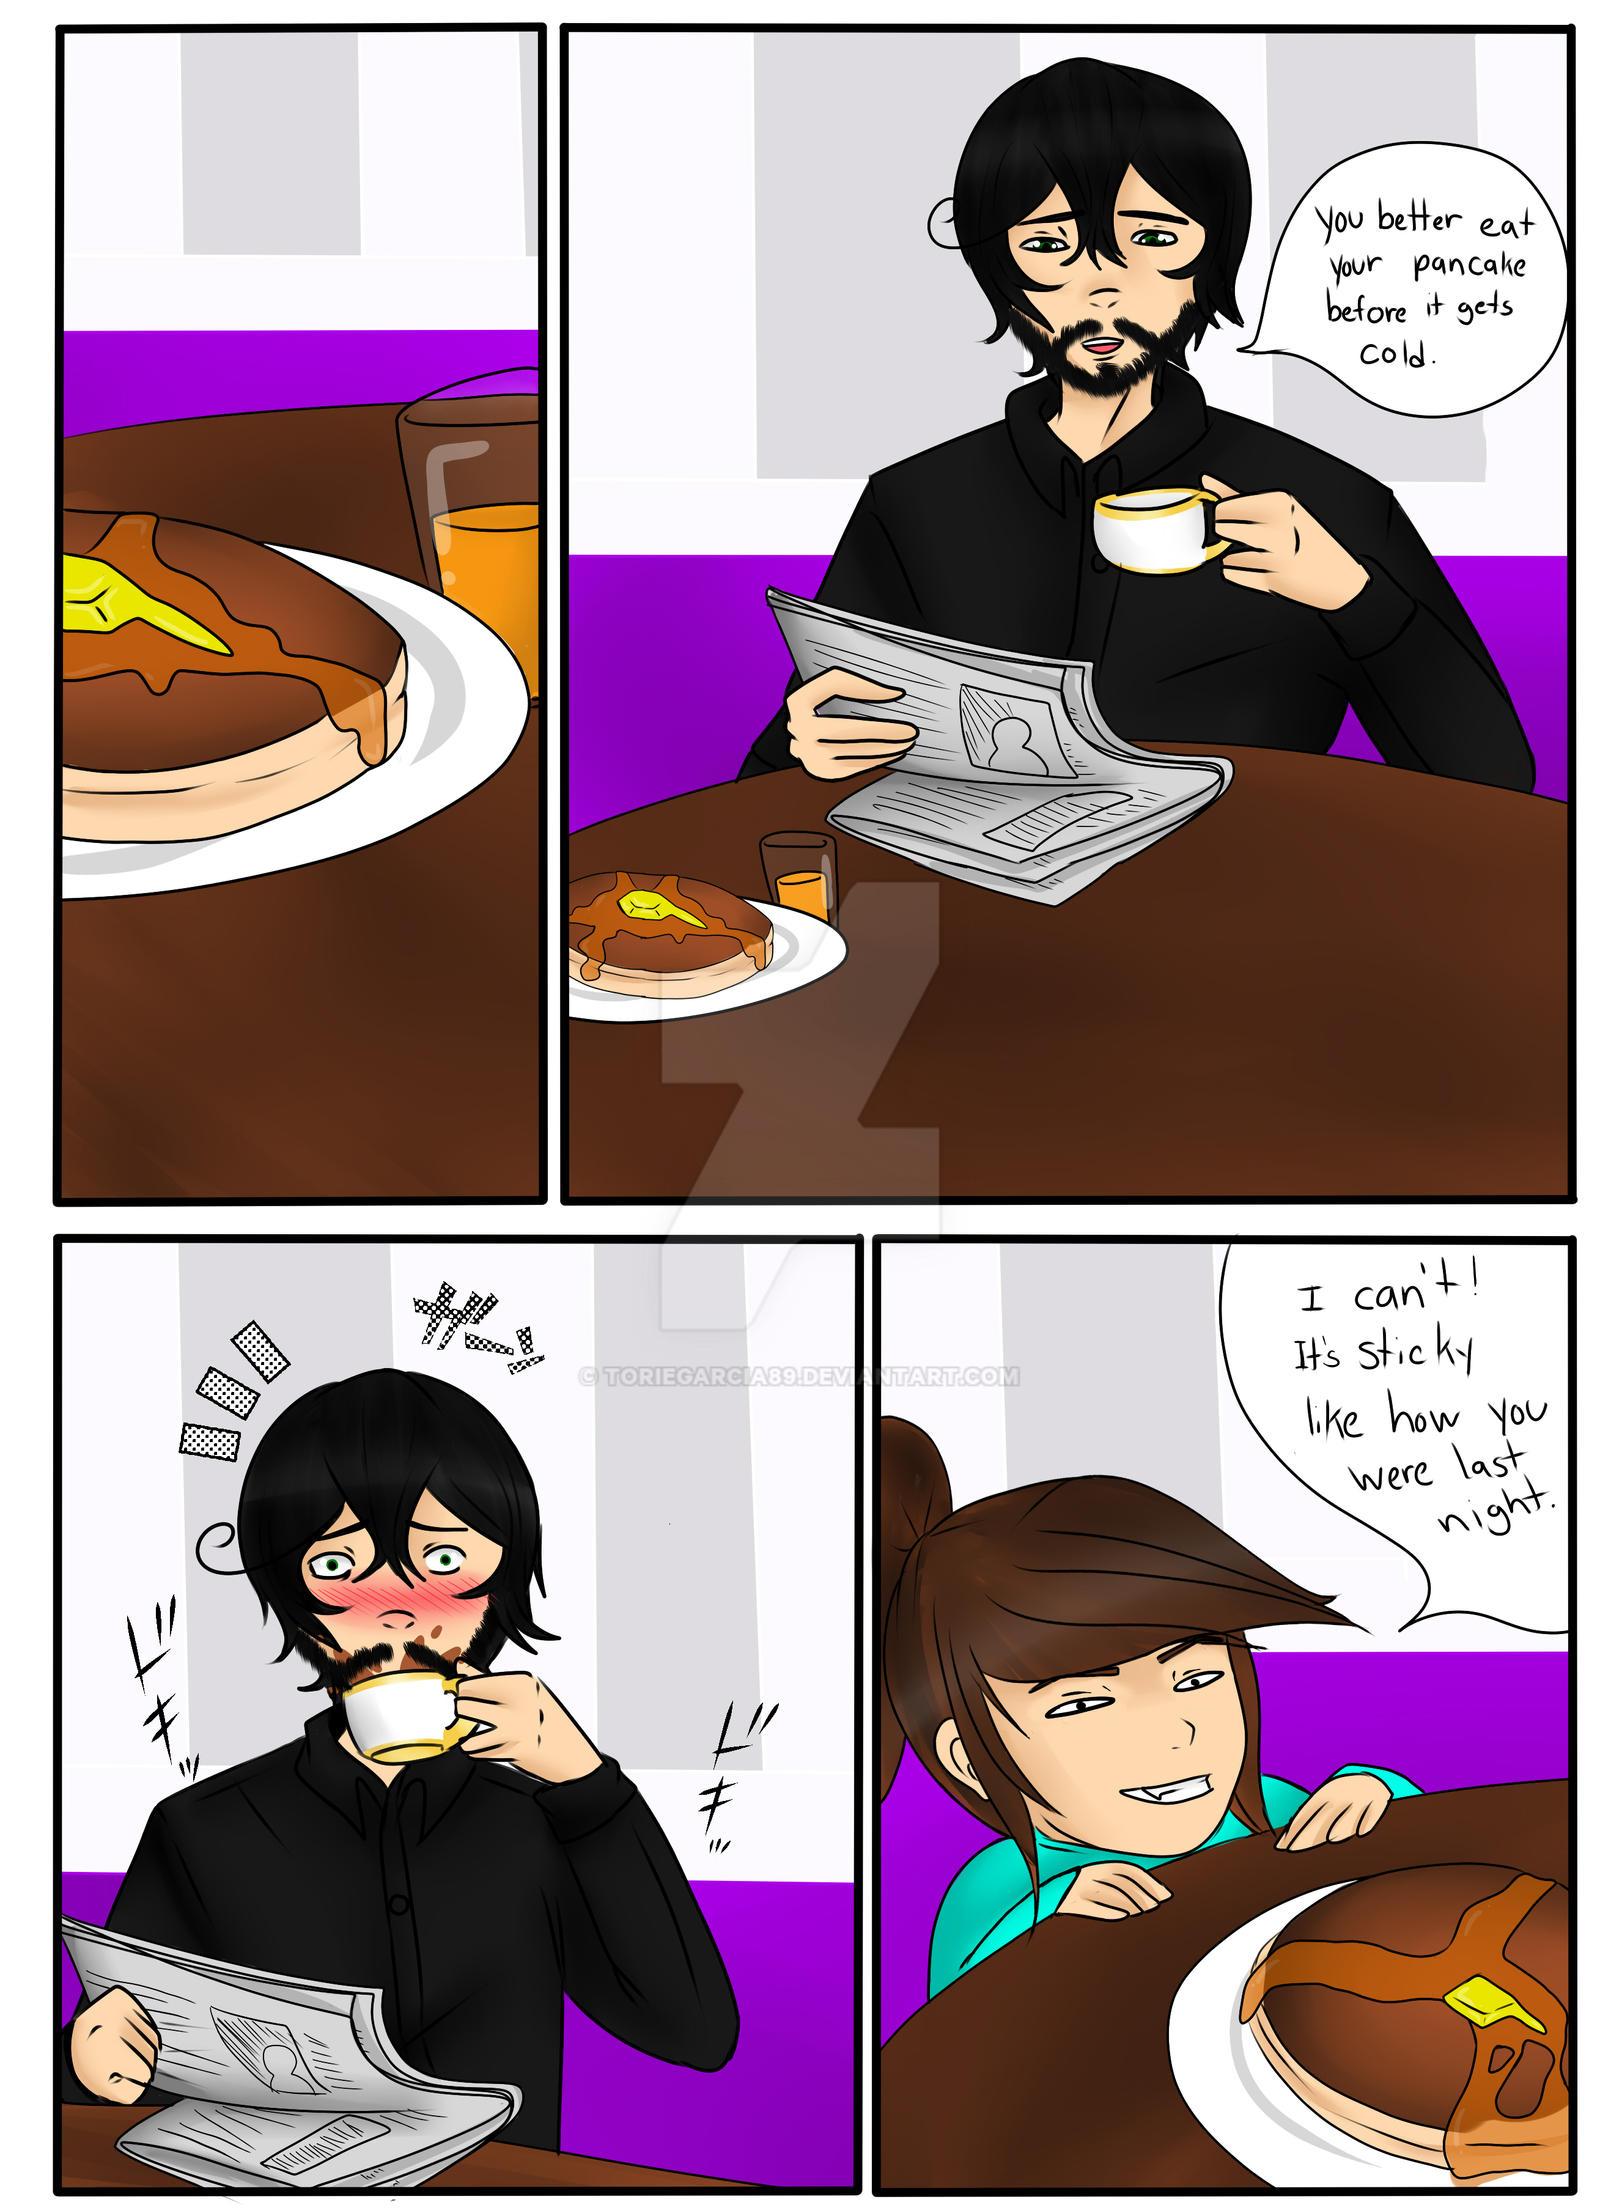 Pancake Scene  (OCs) by toriegarcia89